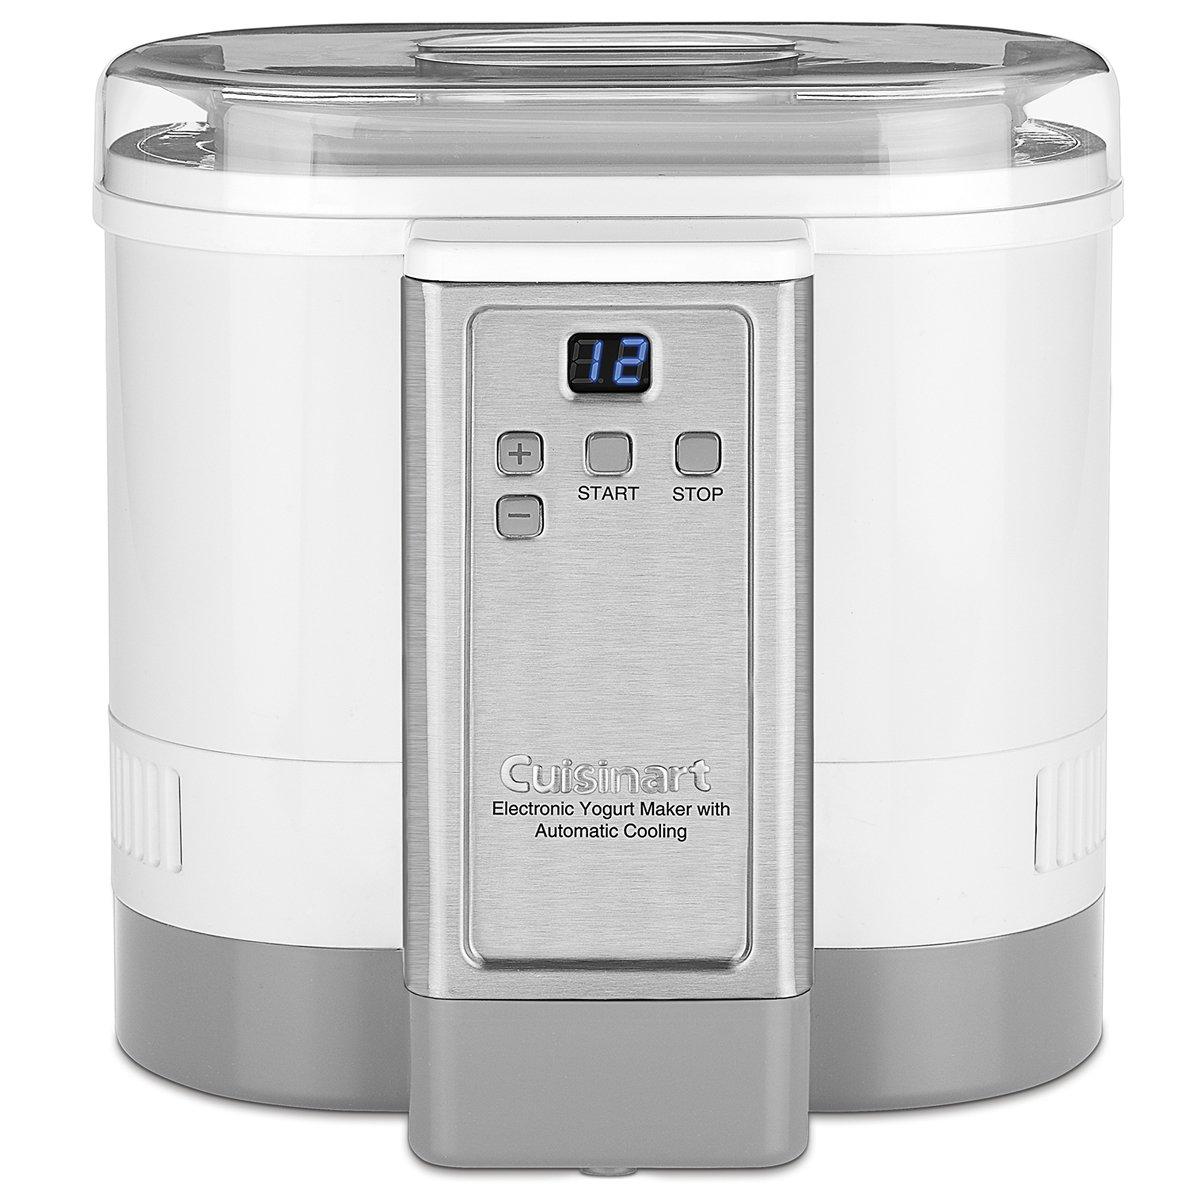 Cuisinart Yogurt Maker - 1.5 L by Cuisinart